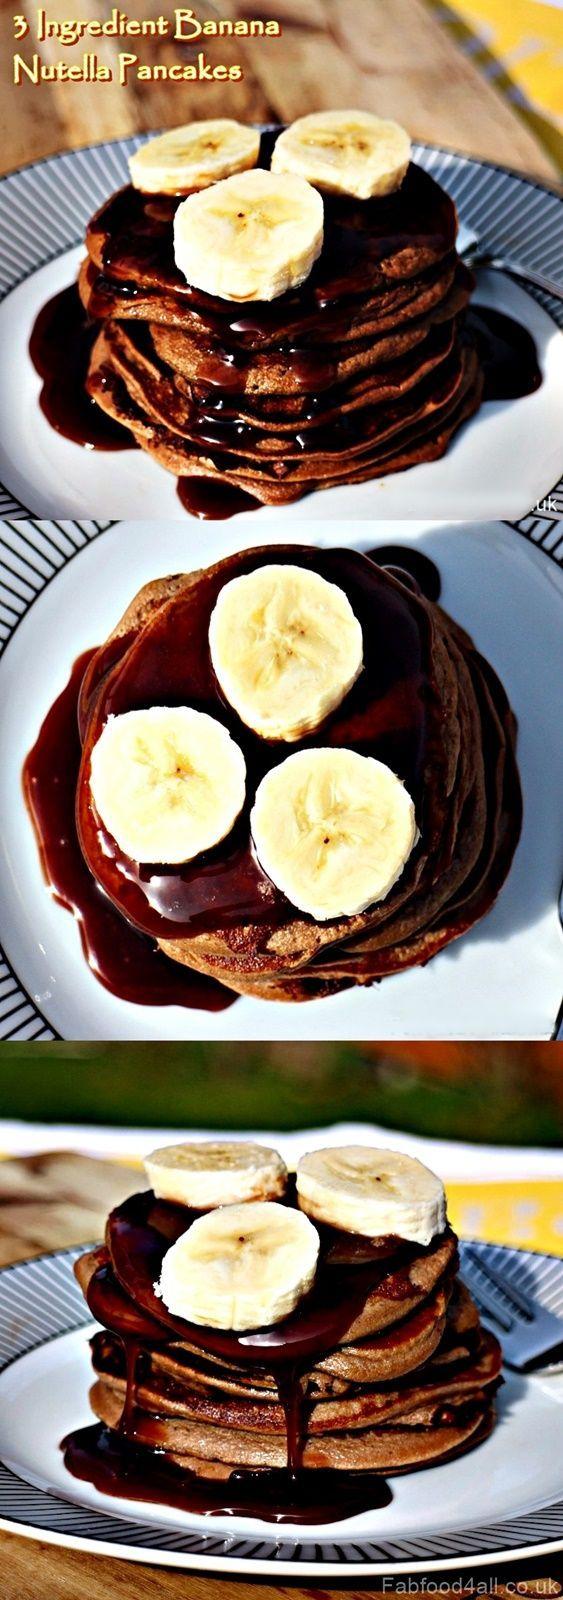 3 Ingredient Banana Nutella Pancakes #Glutenfree - Fab Food 4 All